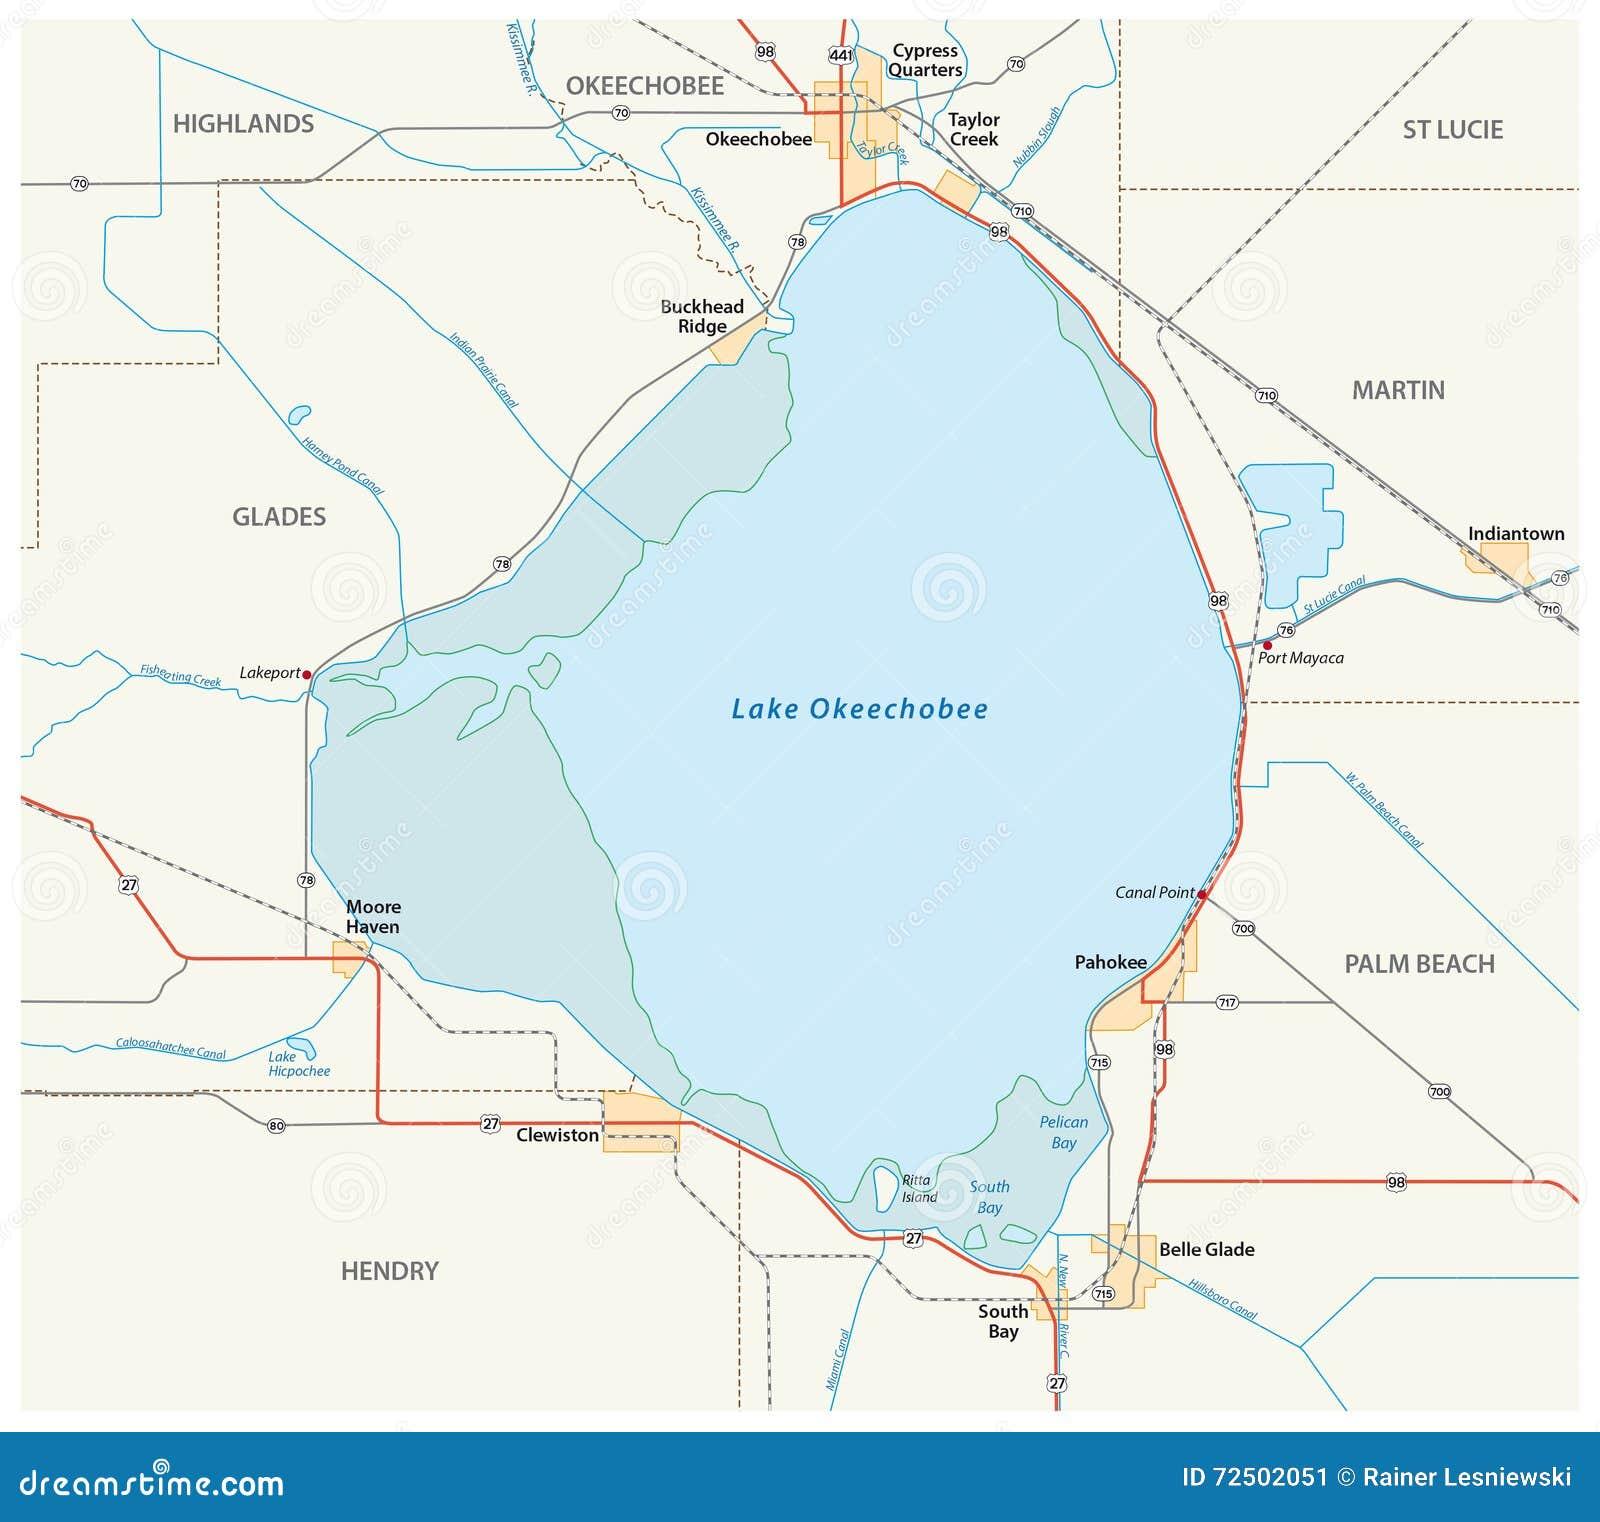 Lake Okeechobee Map Stock Illustration Illustration Of Glades